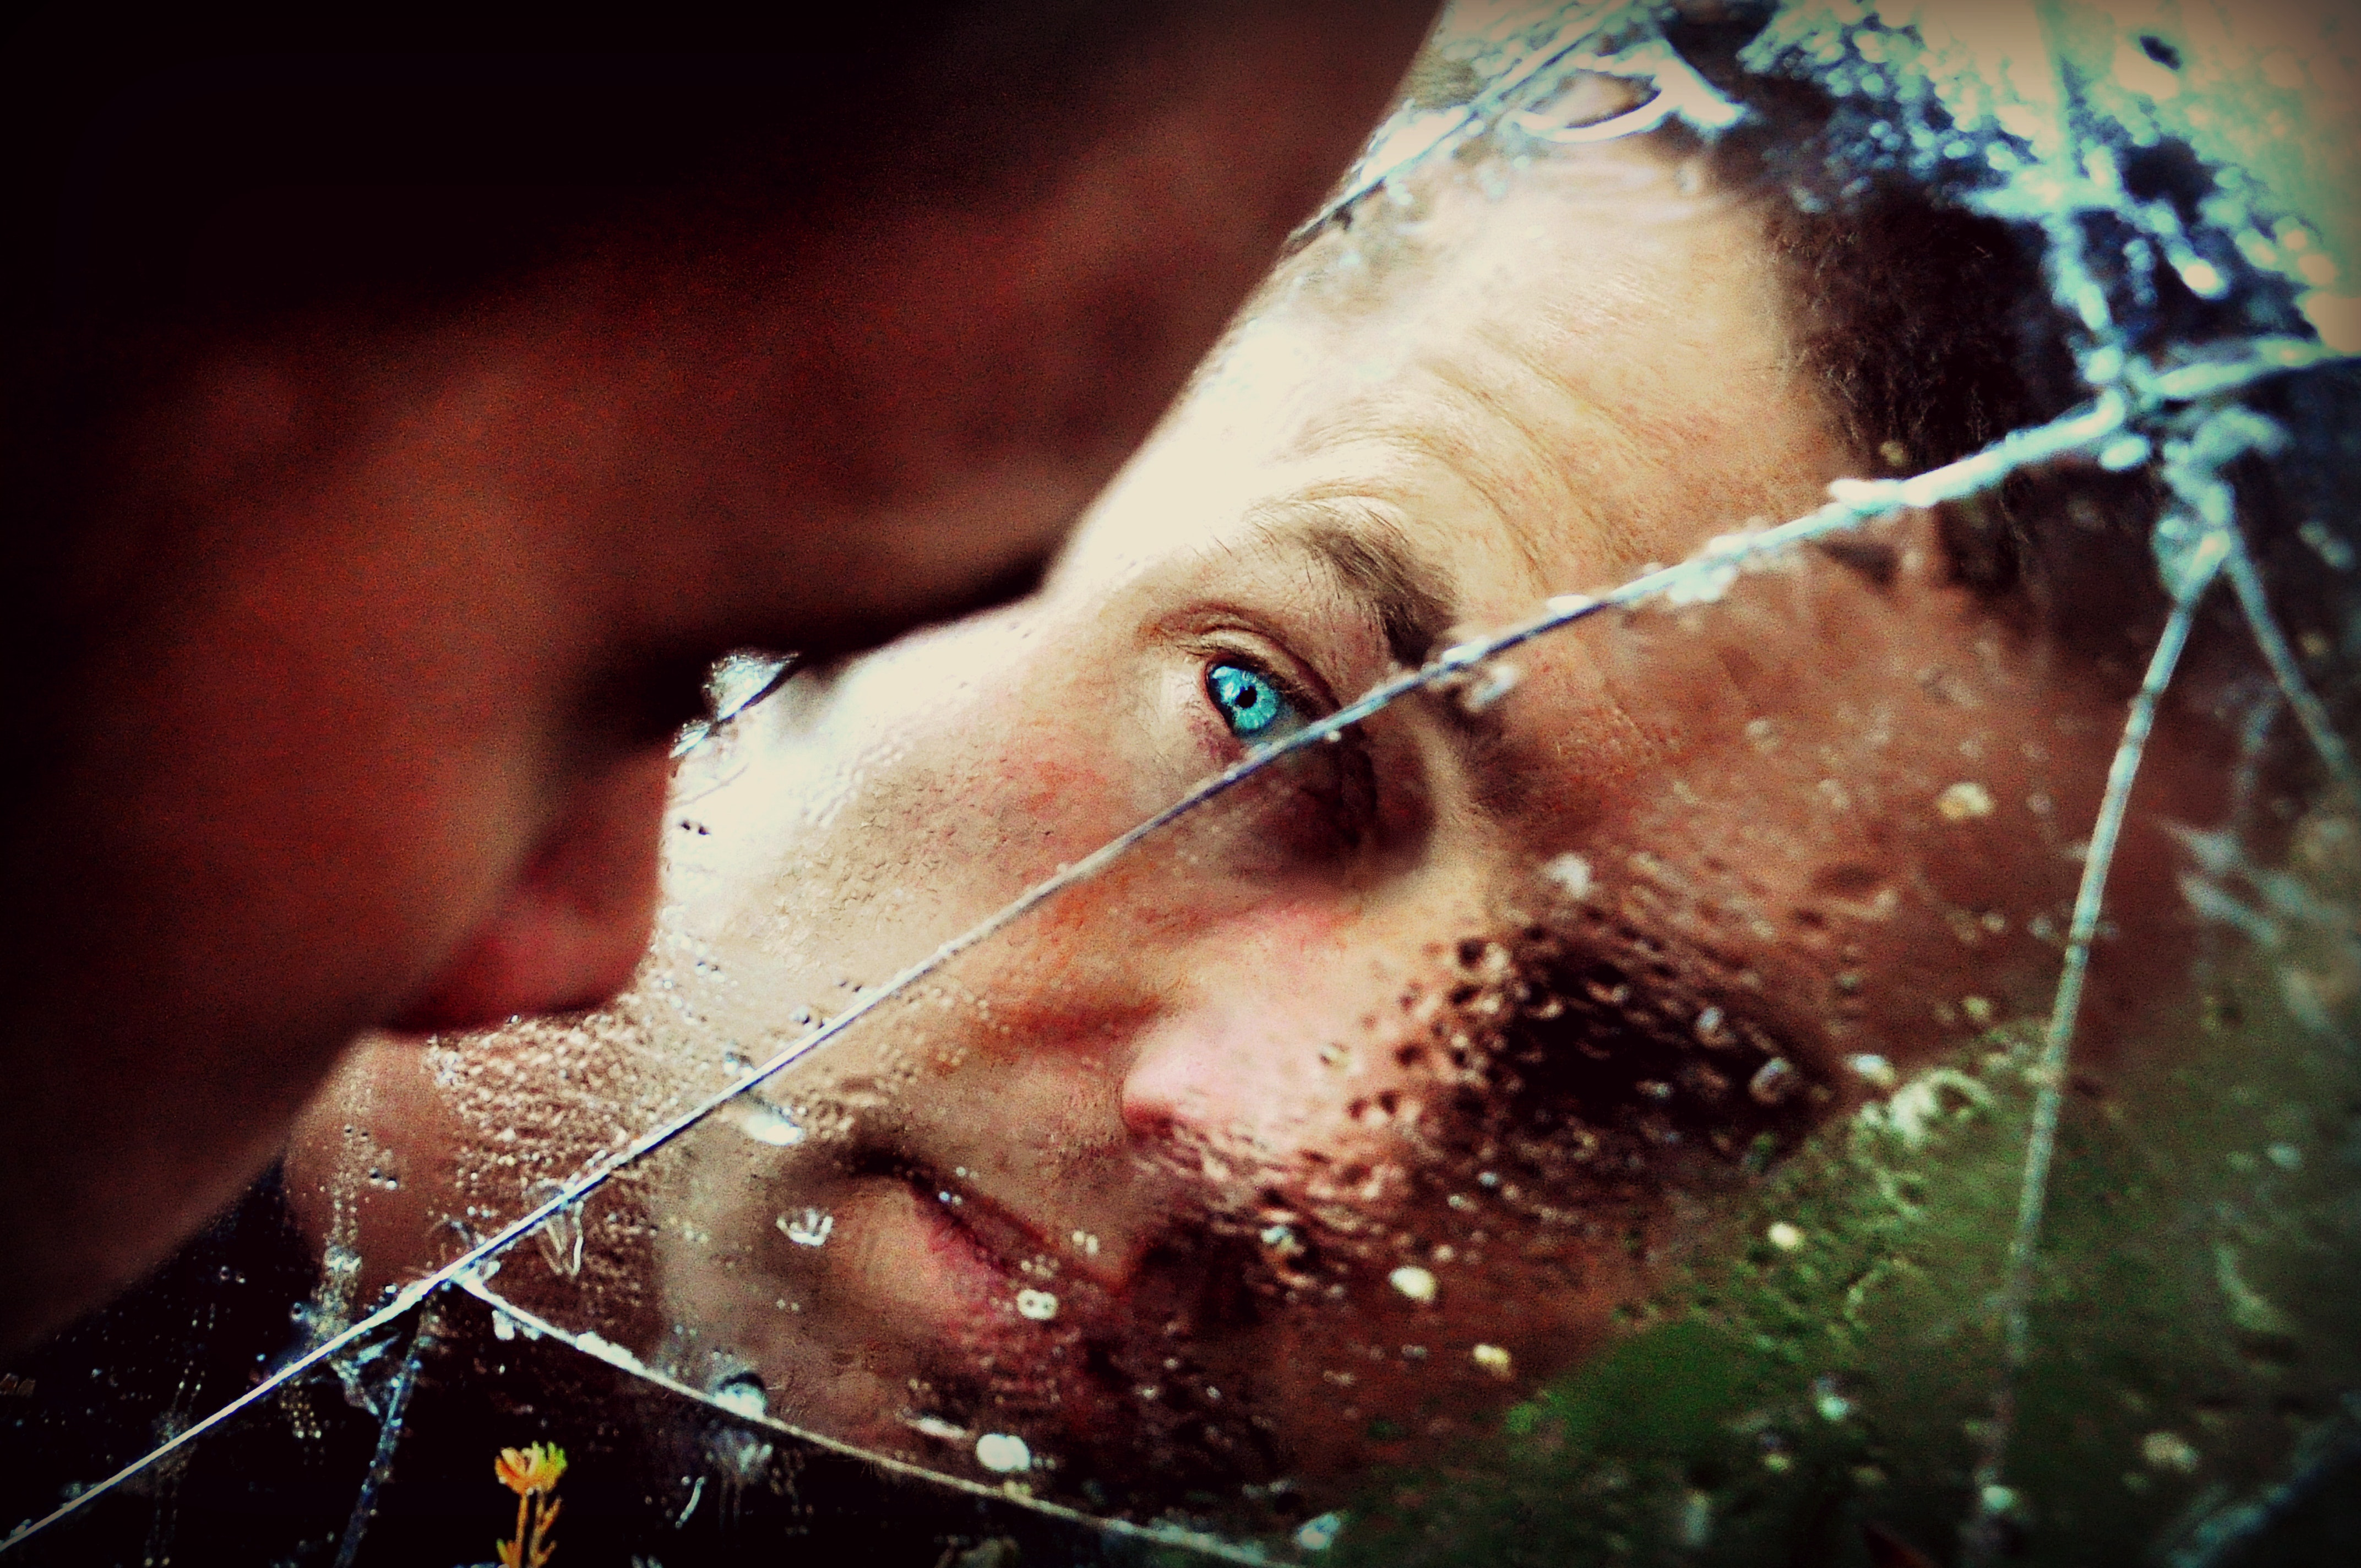 Blue Eyed Man Staring at the Mirror, Depressed, Thinking, Solitude, Sad, HQ Photo